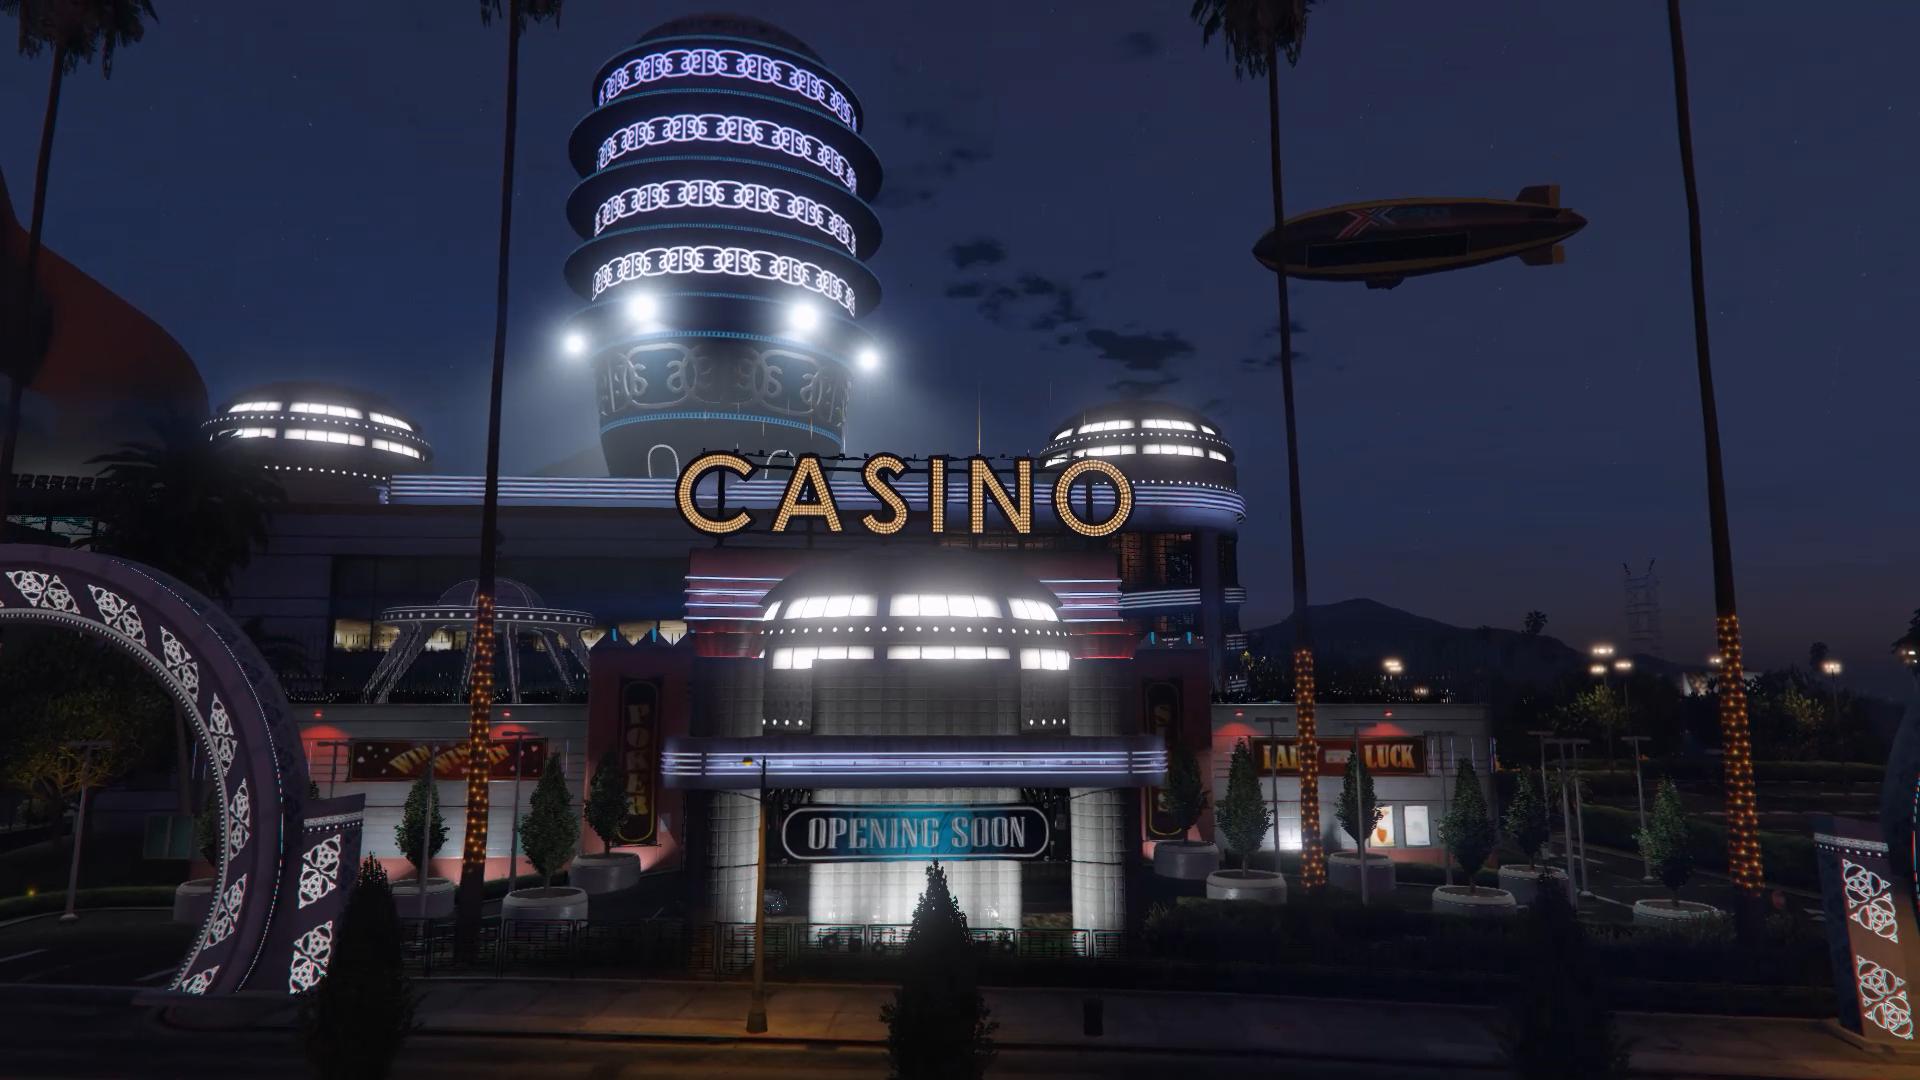 Gta5 Casino